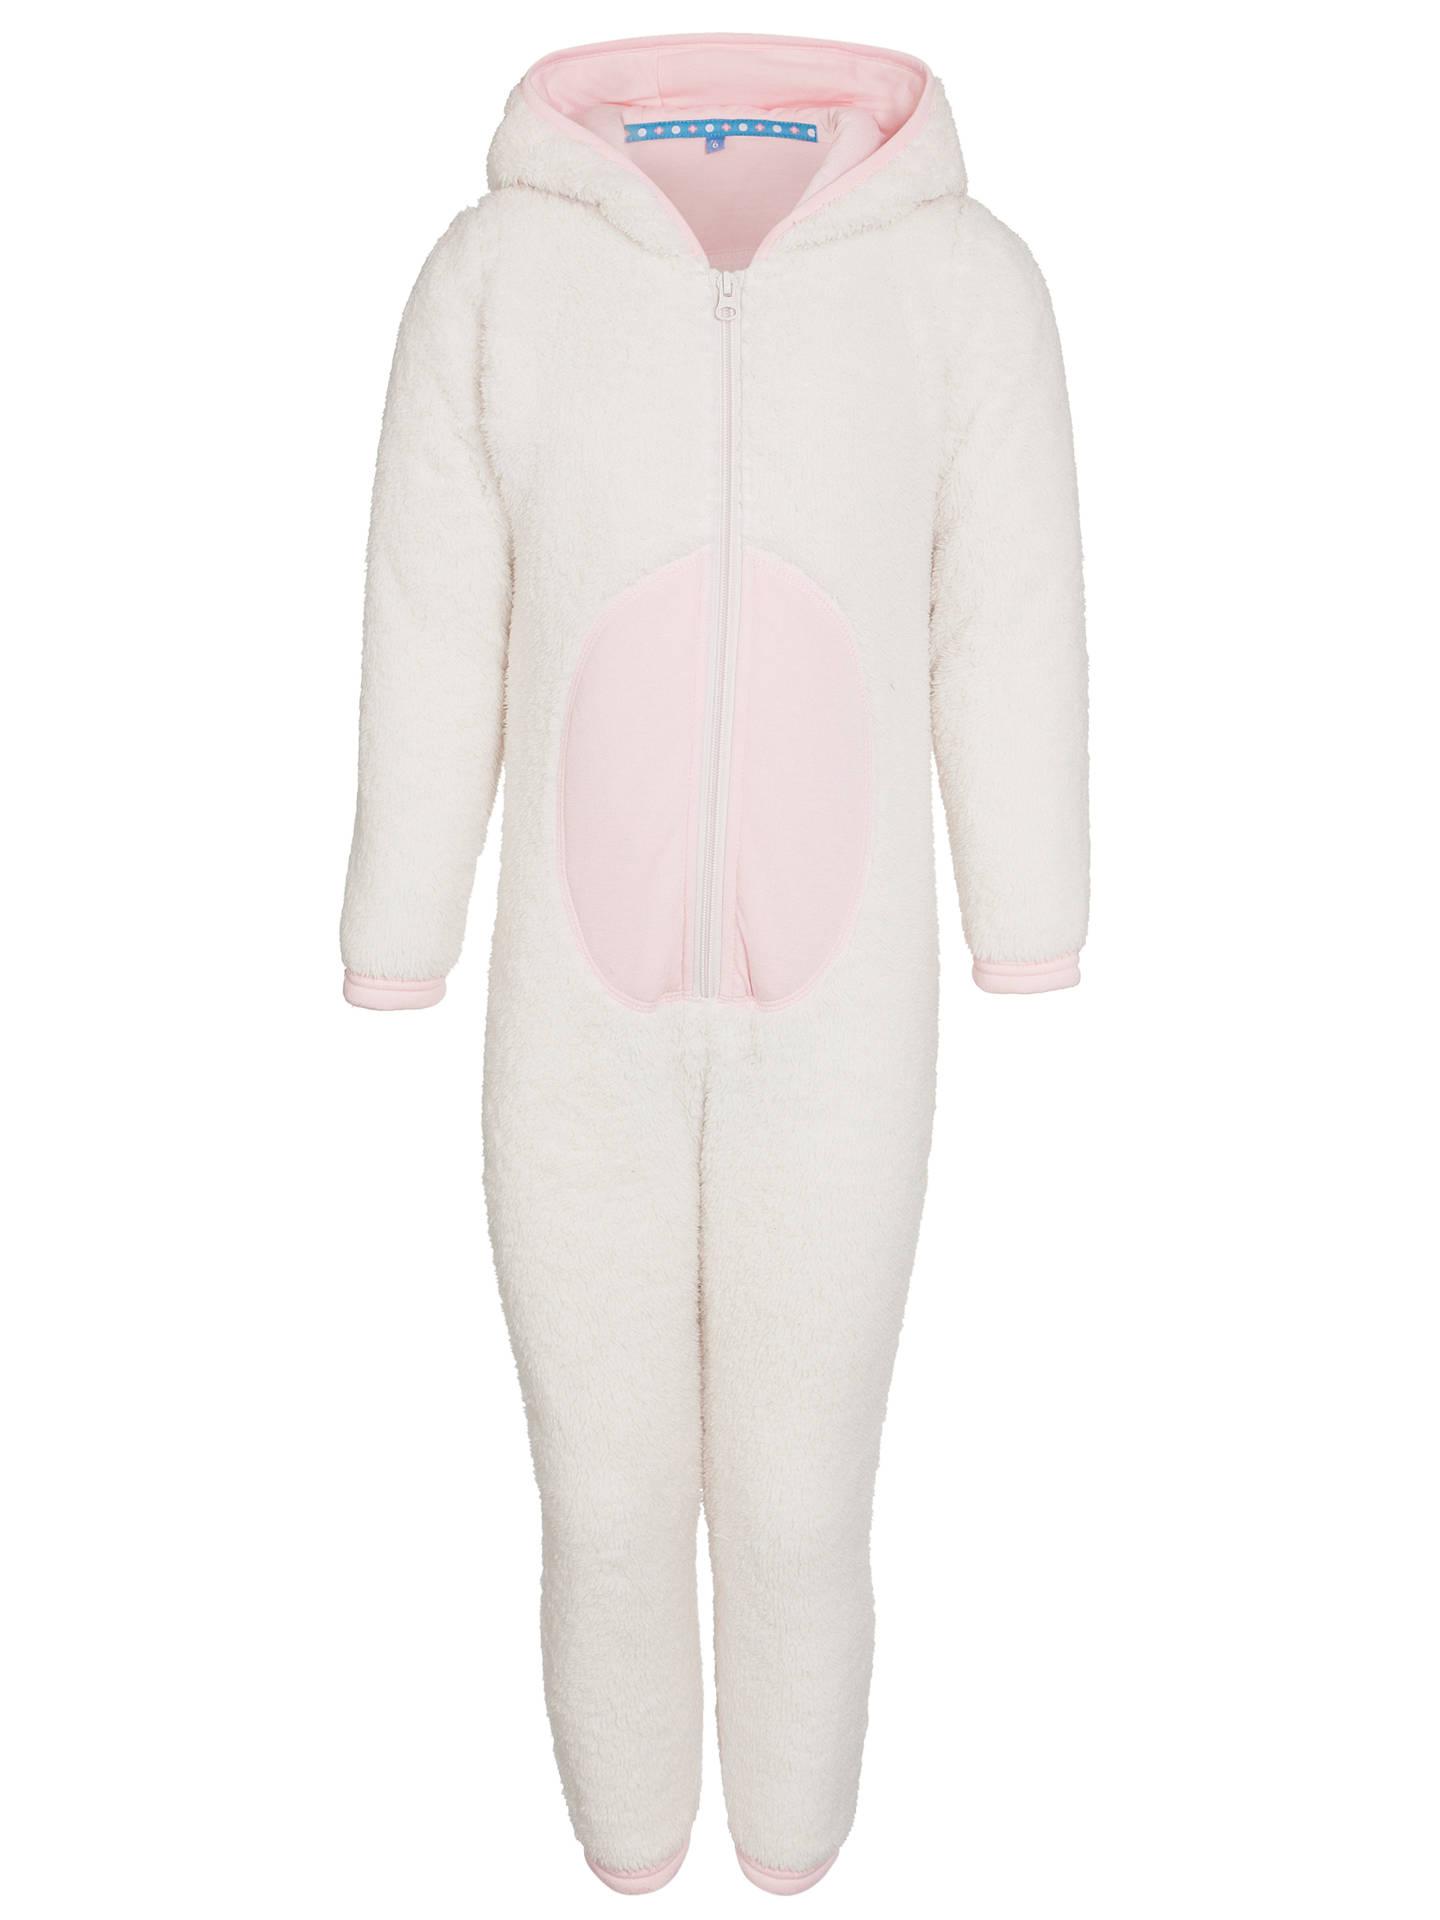 3dd8ad265 John Lewis Girl Rabbit Fleece Onesie